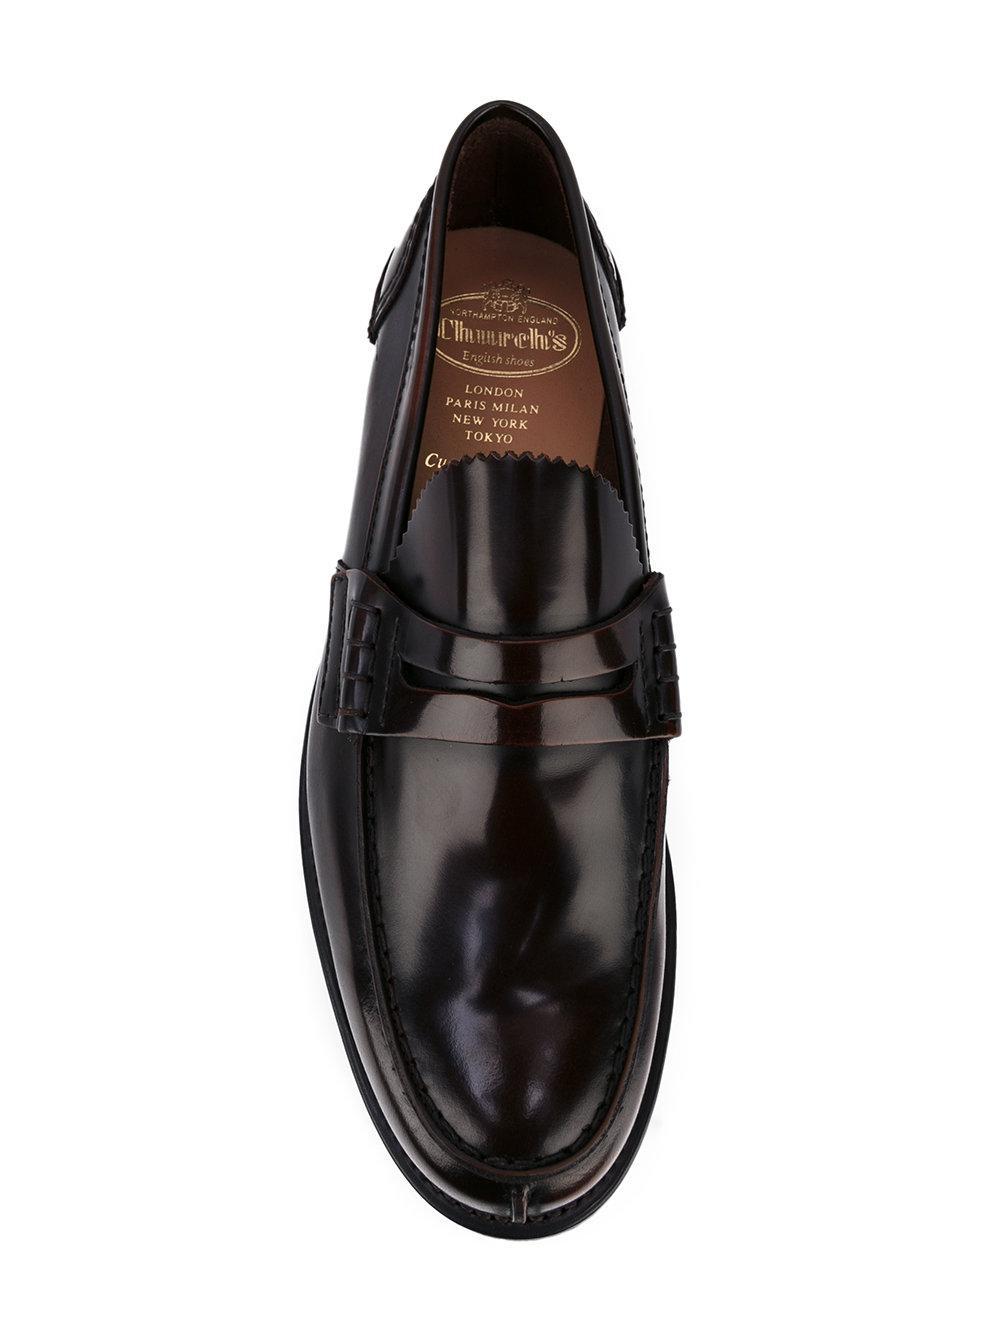 ed706e0c32f Church s - Brown Tunbridge Loafers for Men - Lyst. View fullscreen